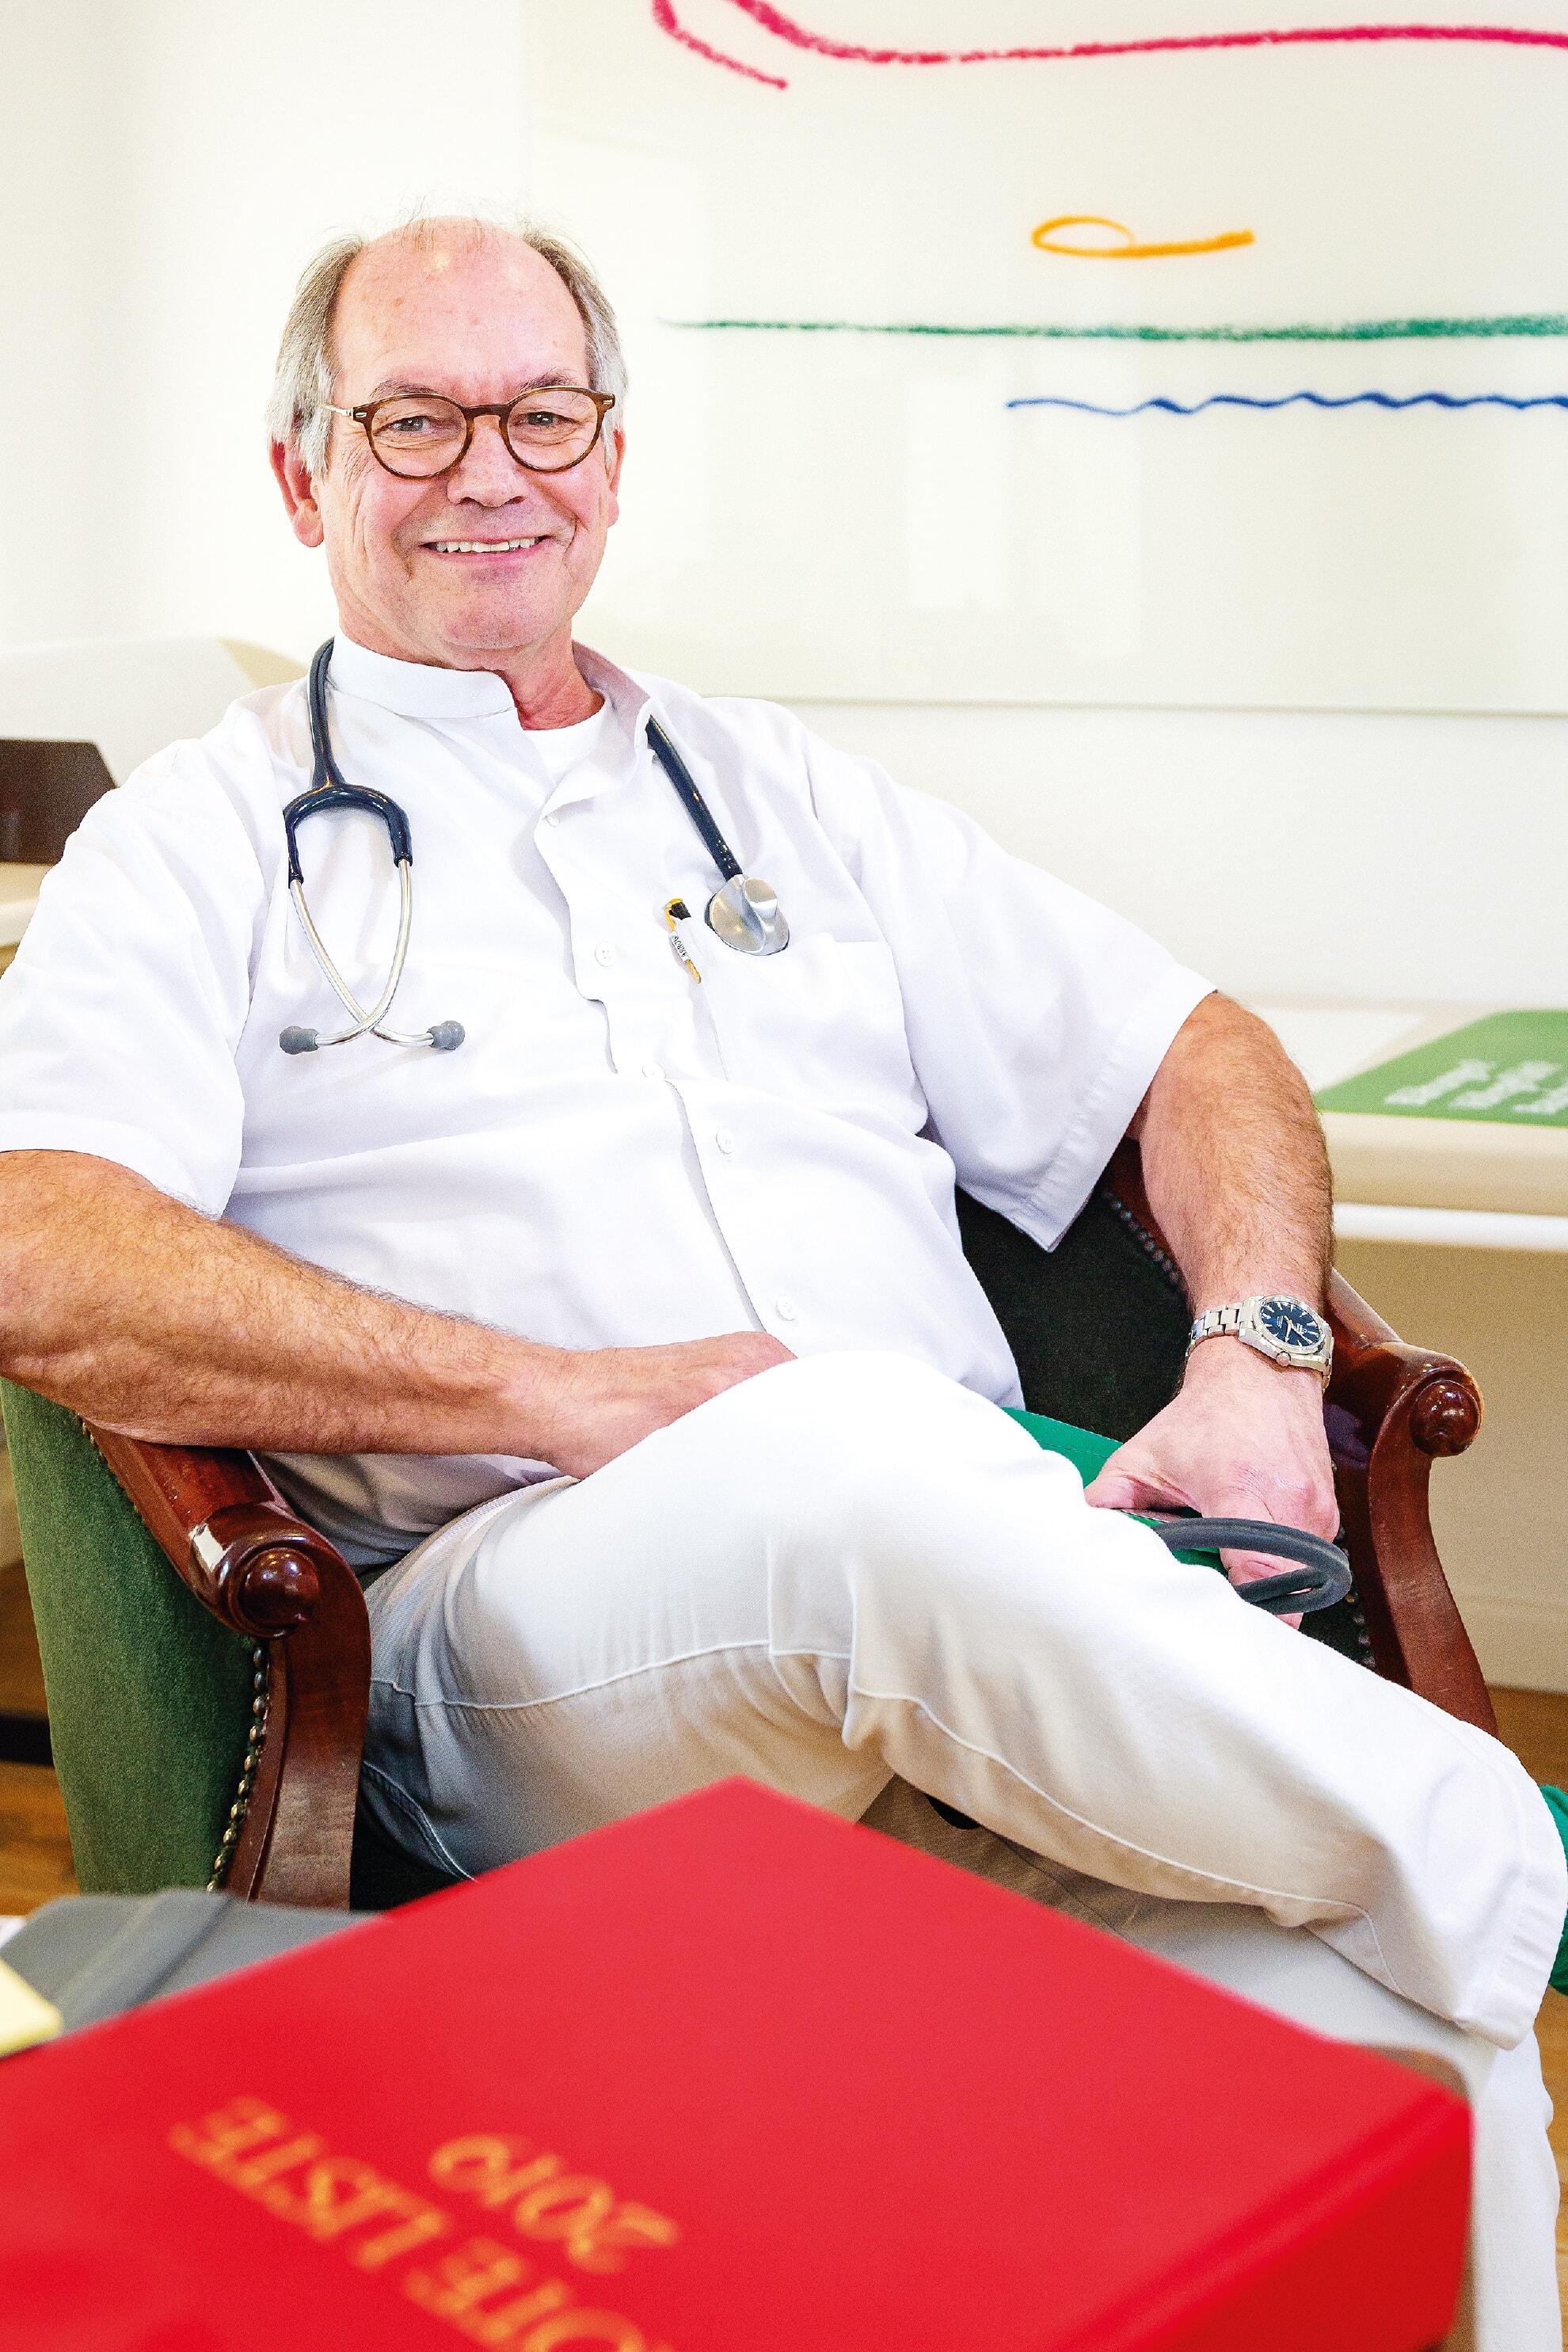 Dr. Alexander Cegla